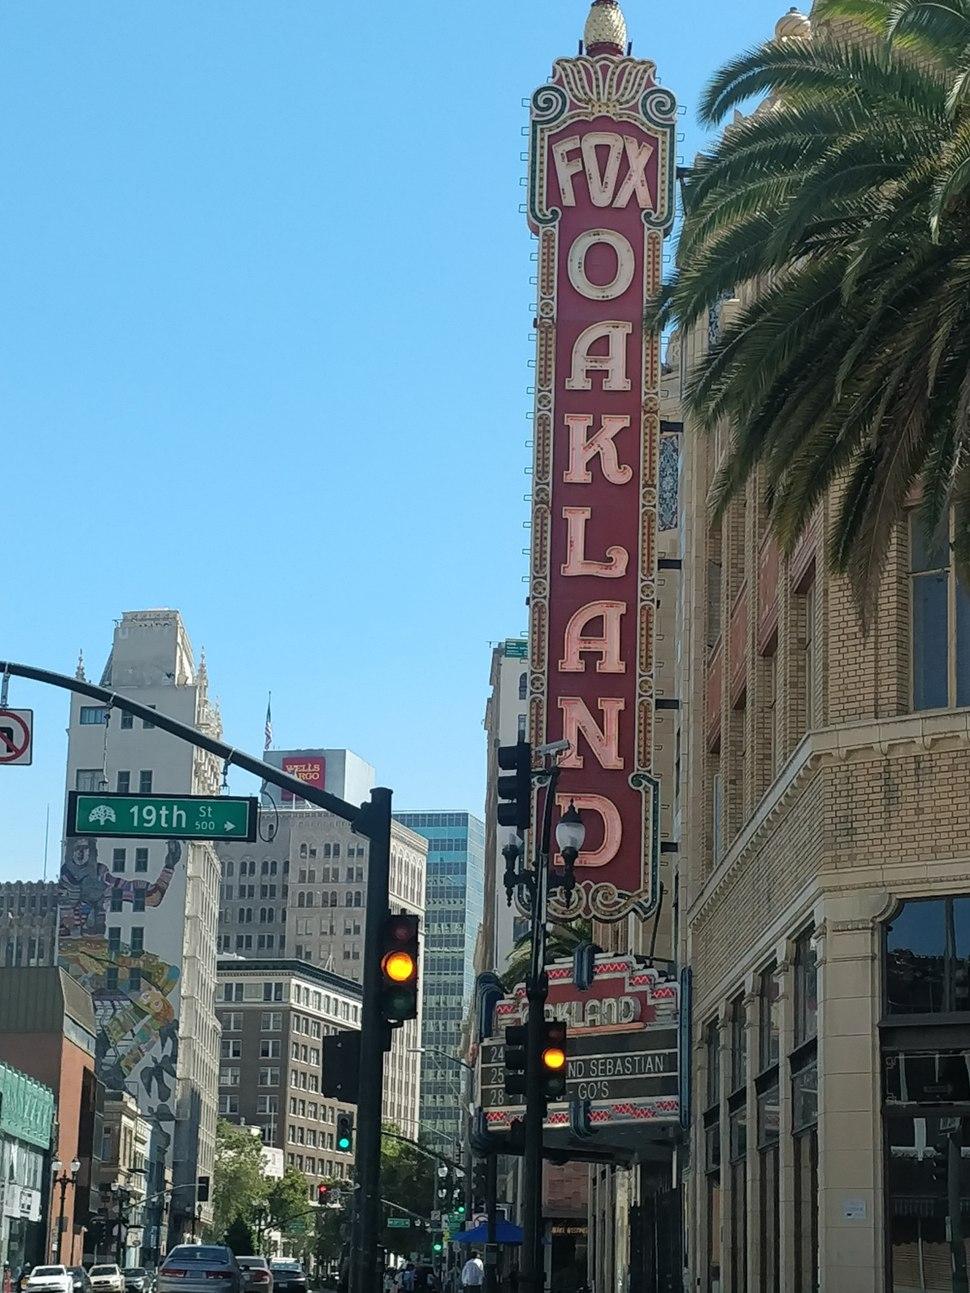 Fox-oakland-theatre-uptown-oakland